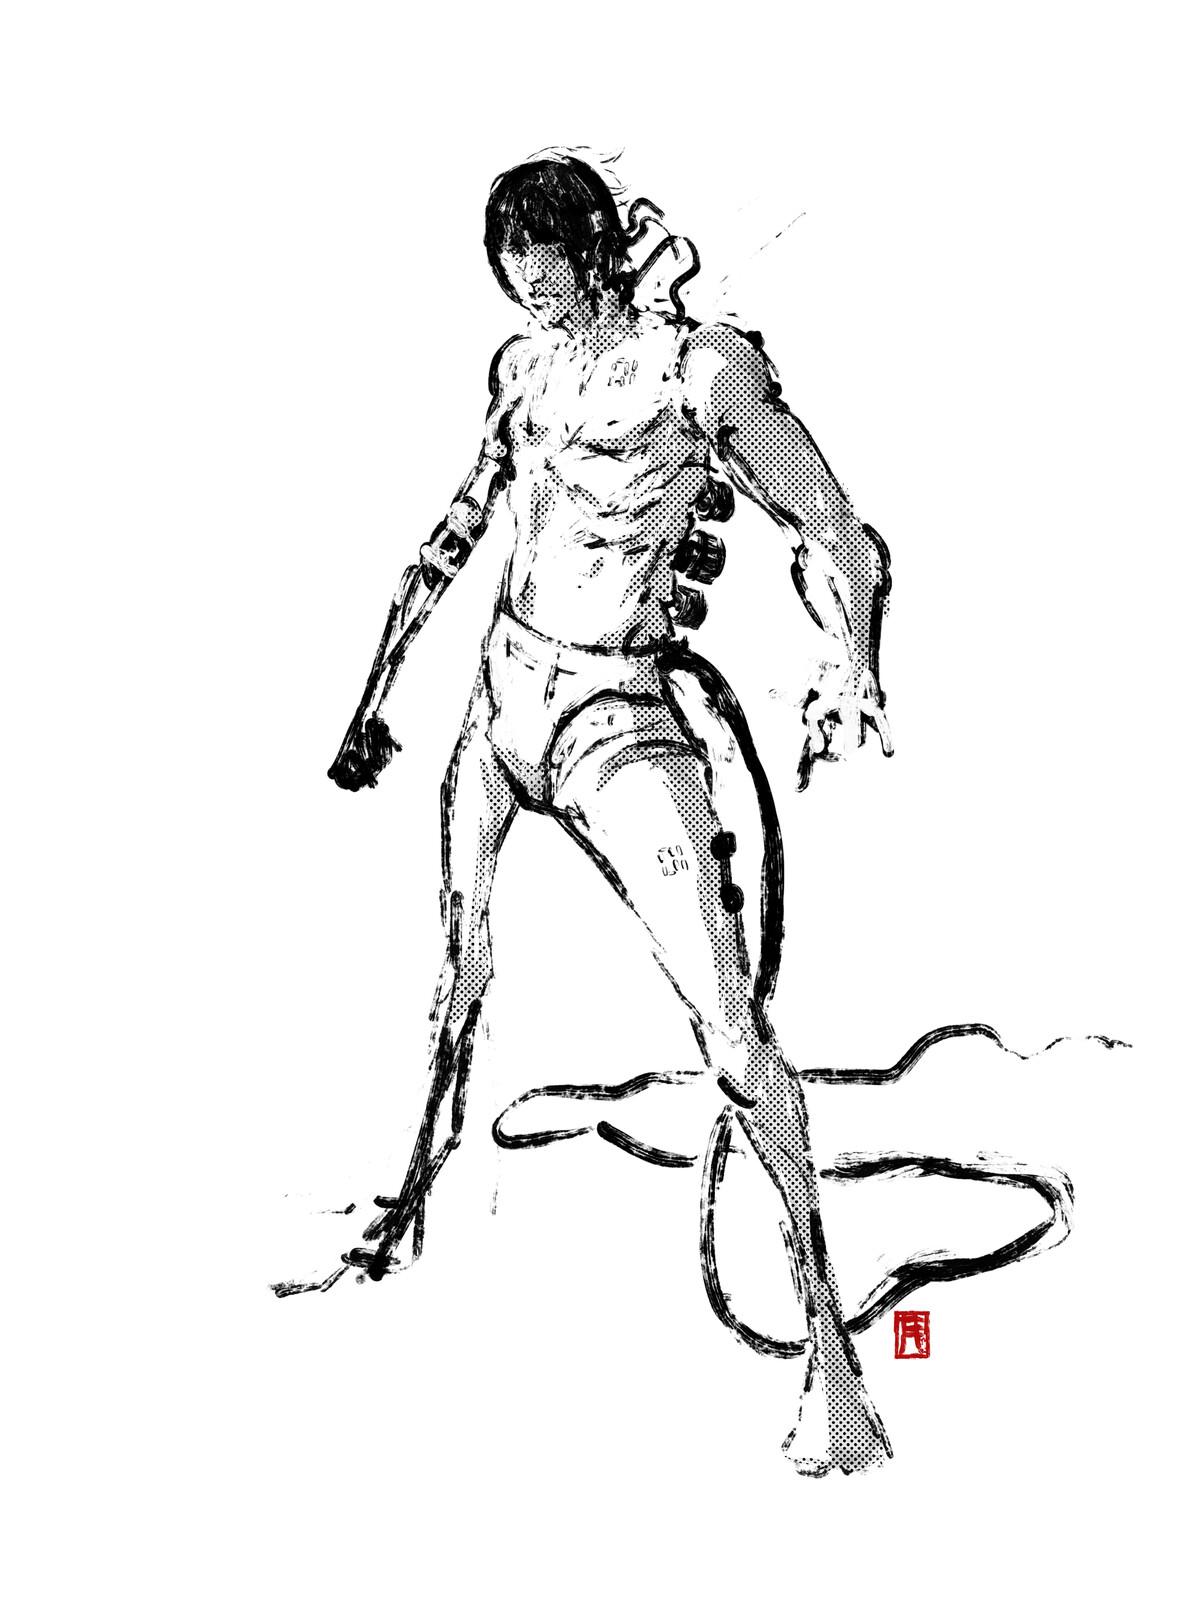 Jockstrap Man//01